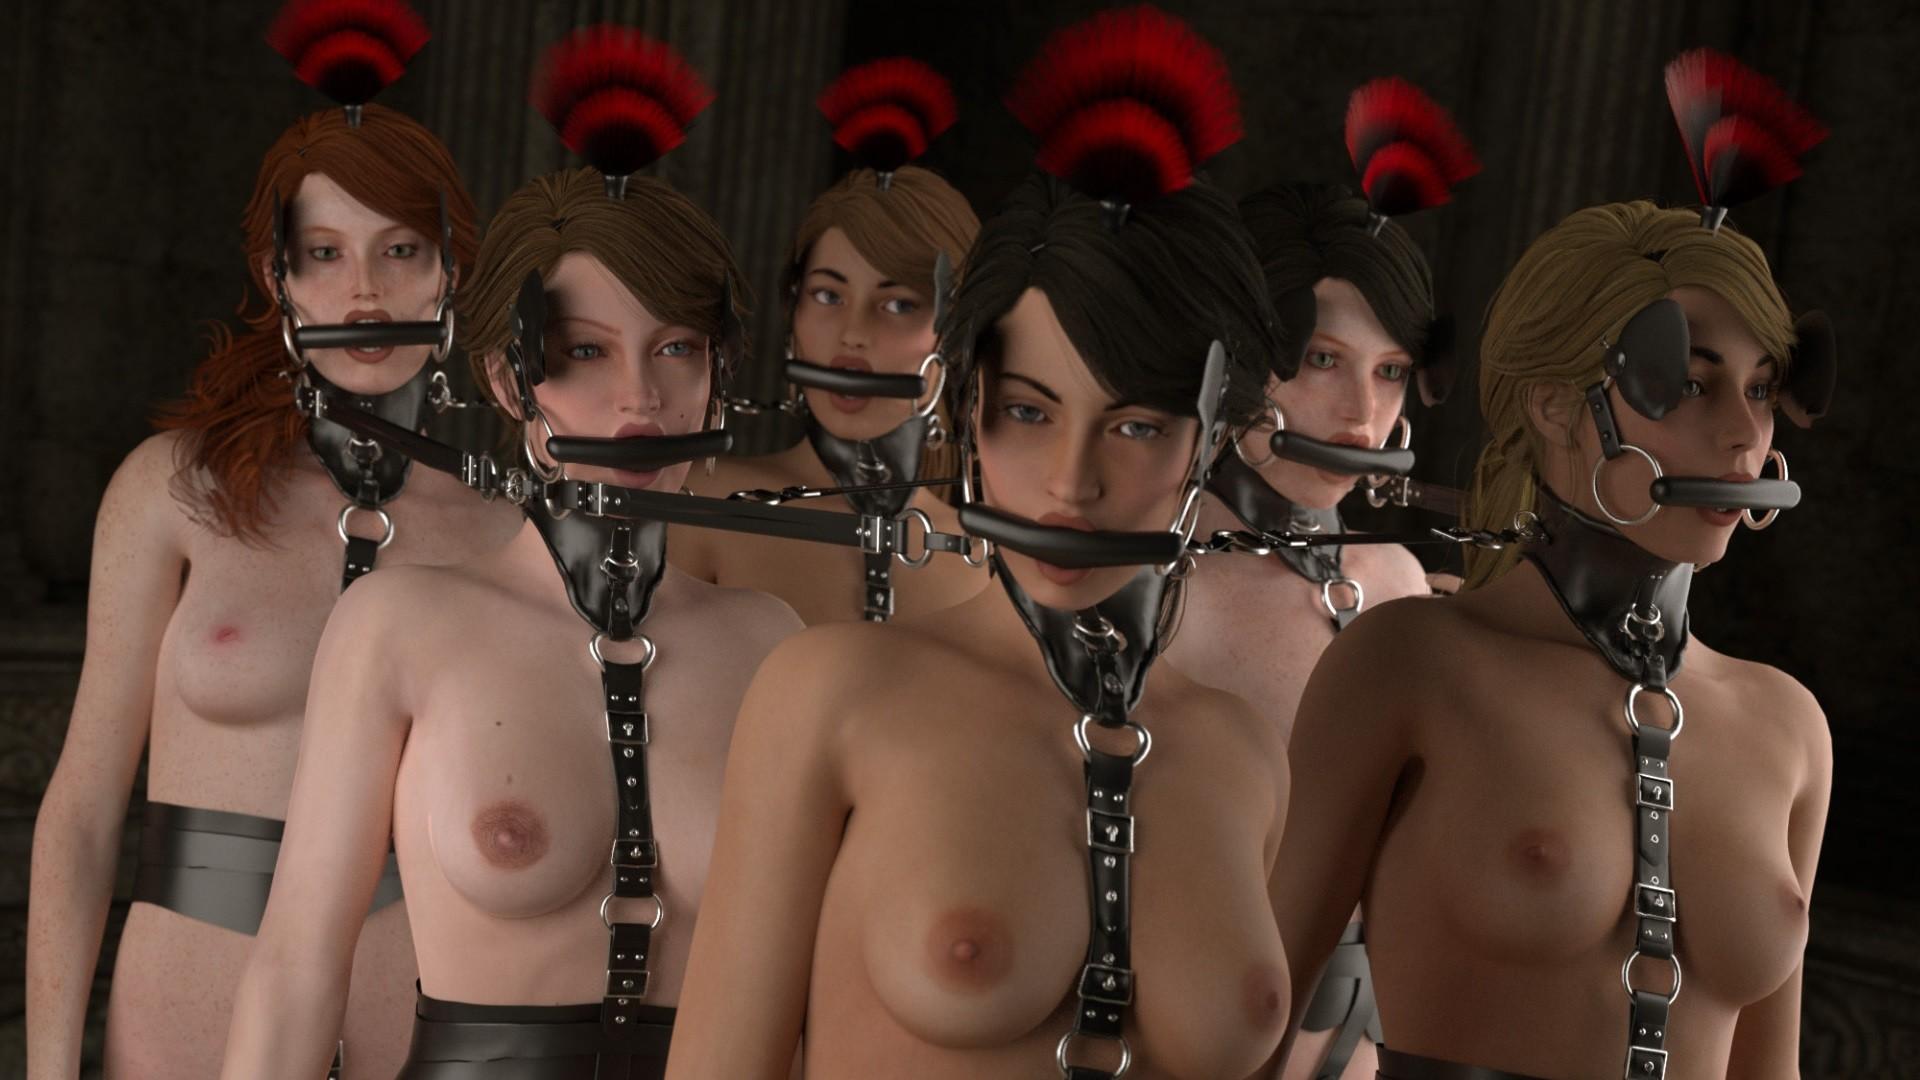 Free slave sex pics